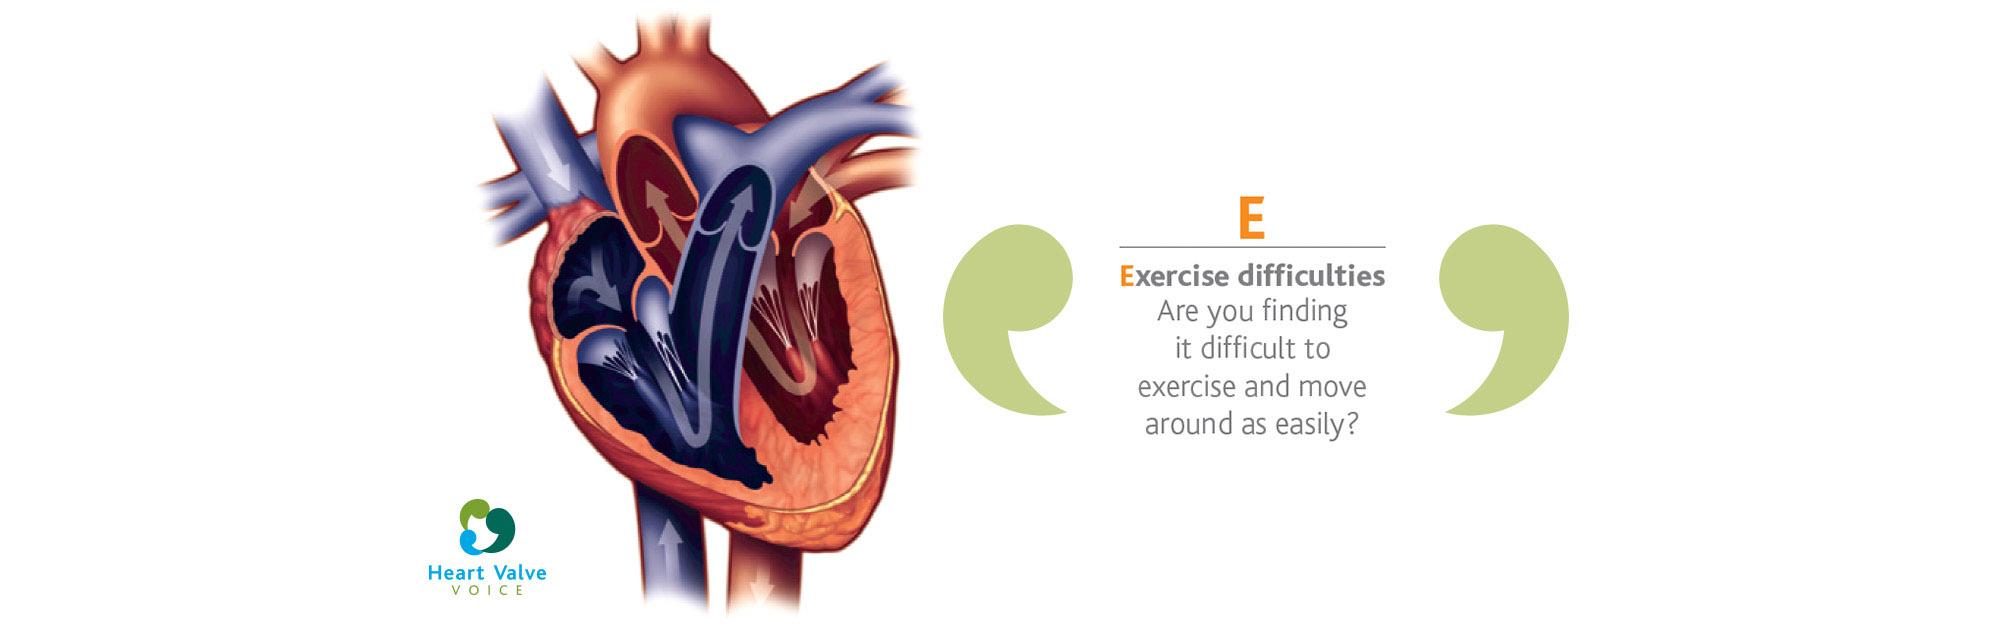 Heart check - E copy 2.jpg